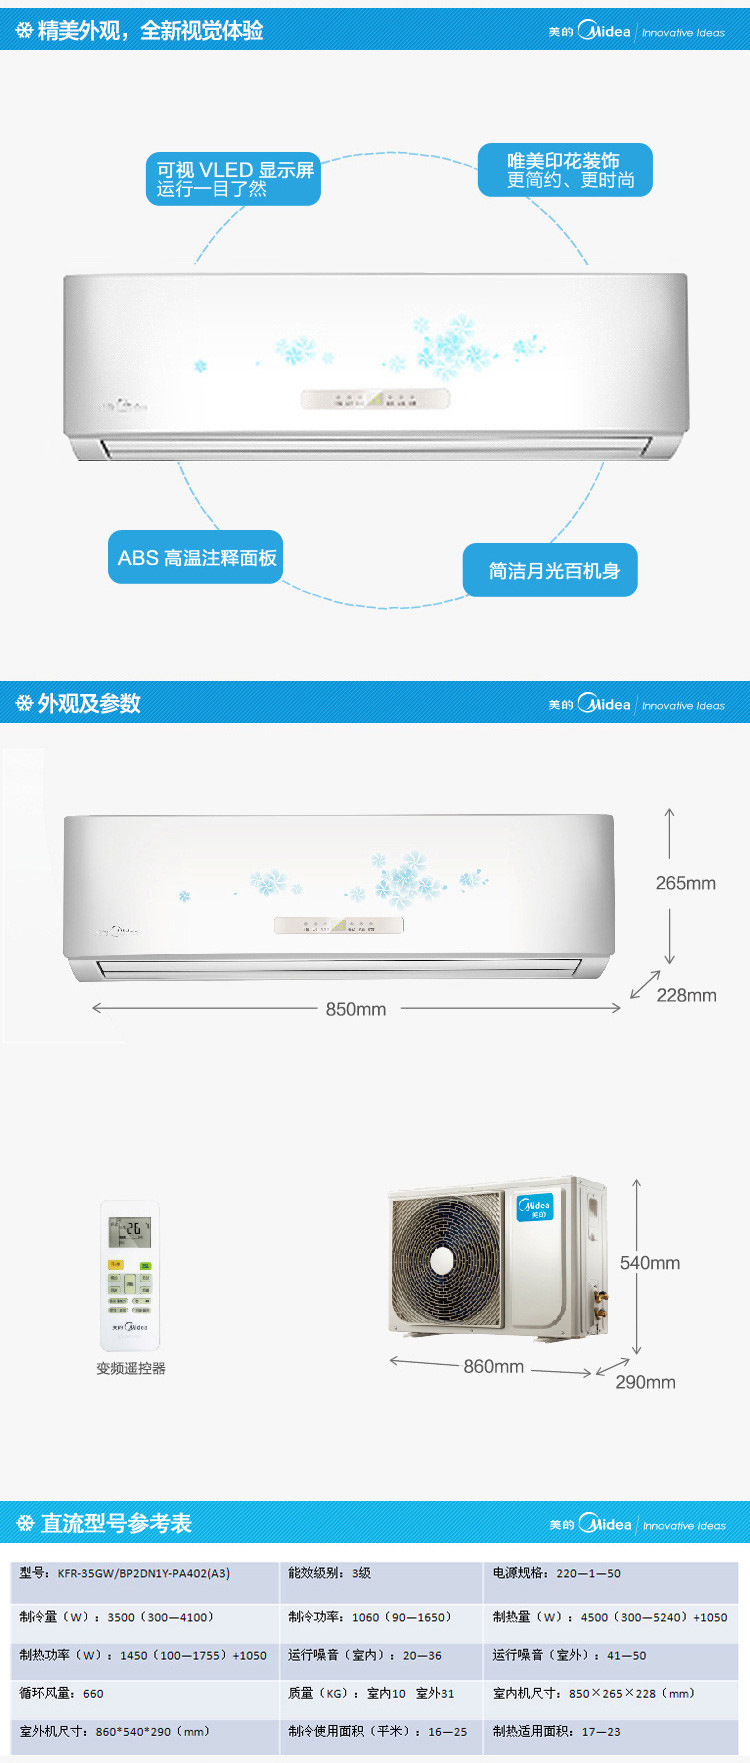 0 tcl kfrd-35gw/bh43 大1.5匹冷暖电辅挂式定频空调 四重静音 2148.